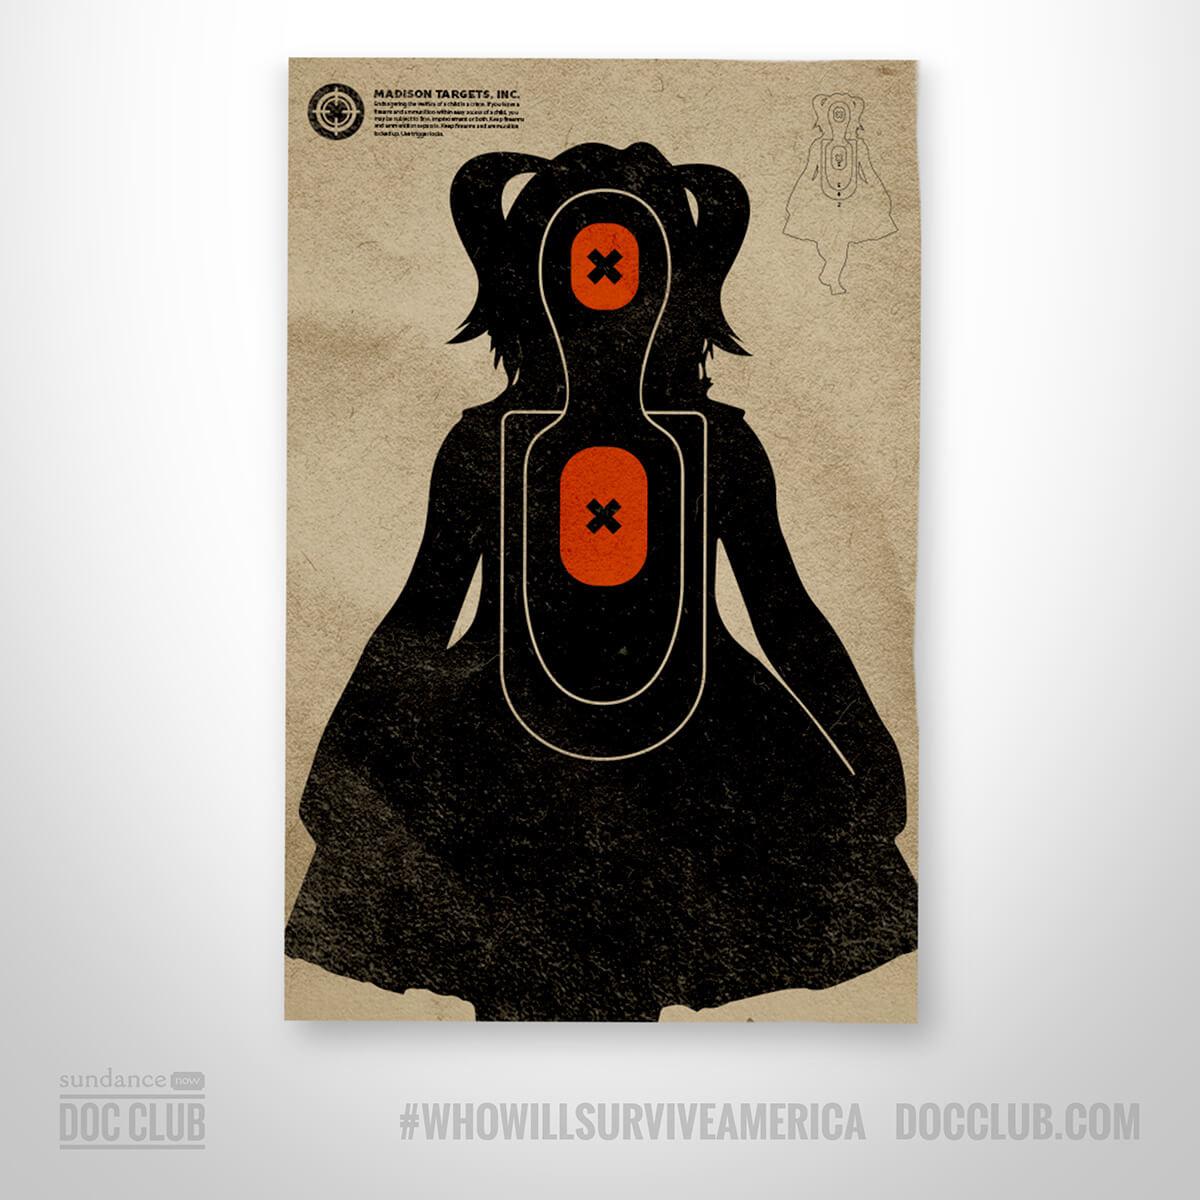 Target practice image